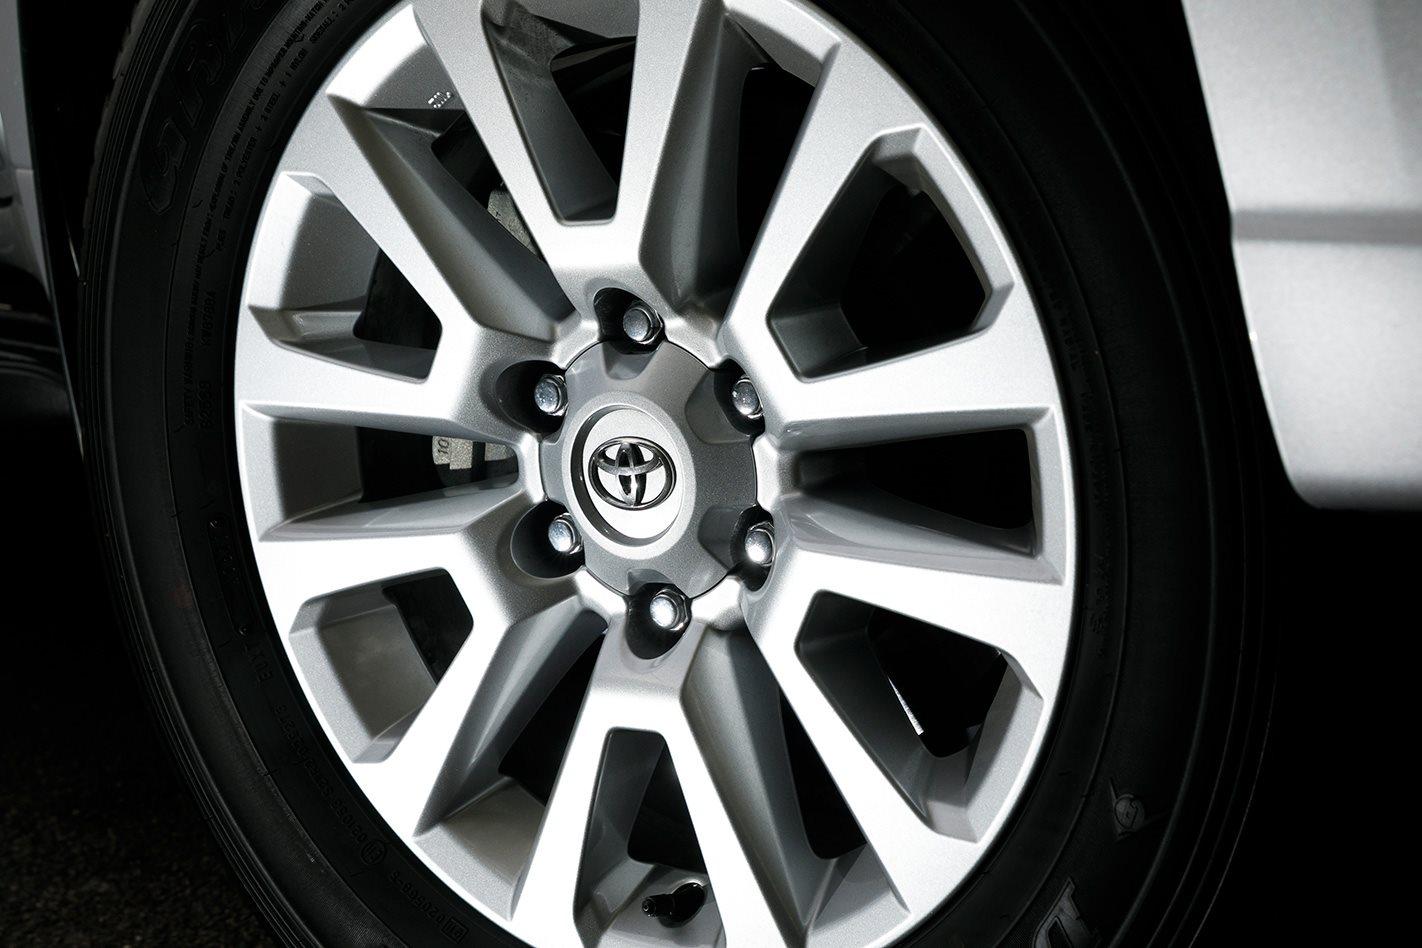 2017 Toyota LandCruiser Prado wheel.jpg